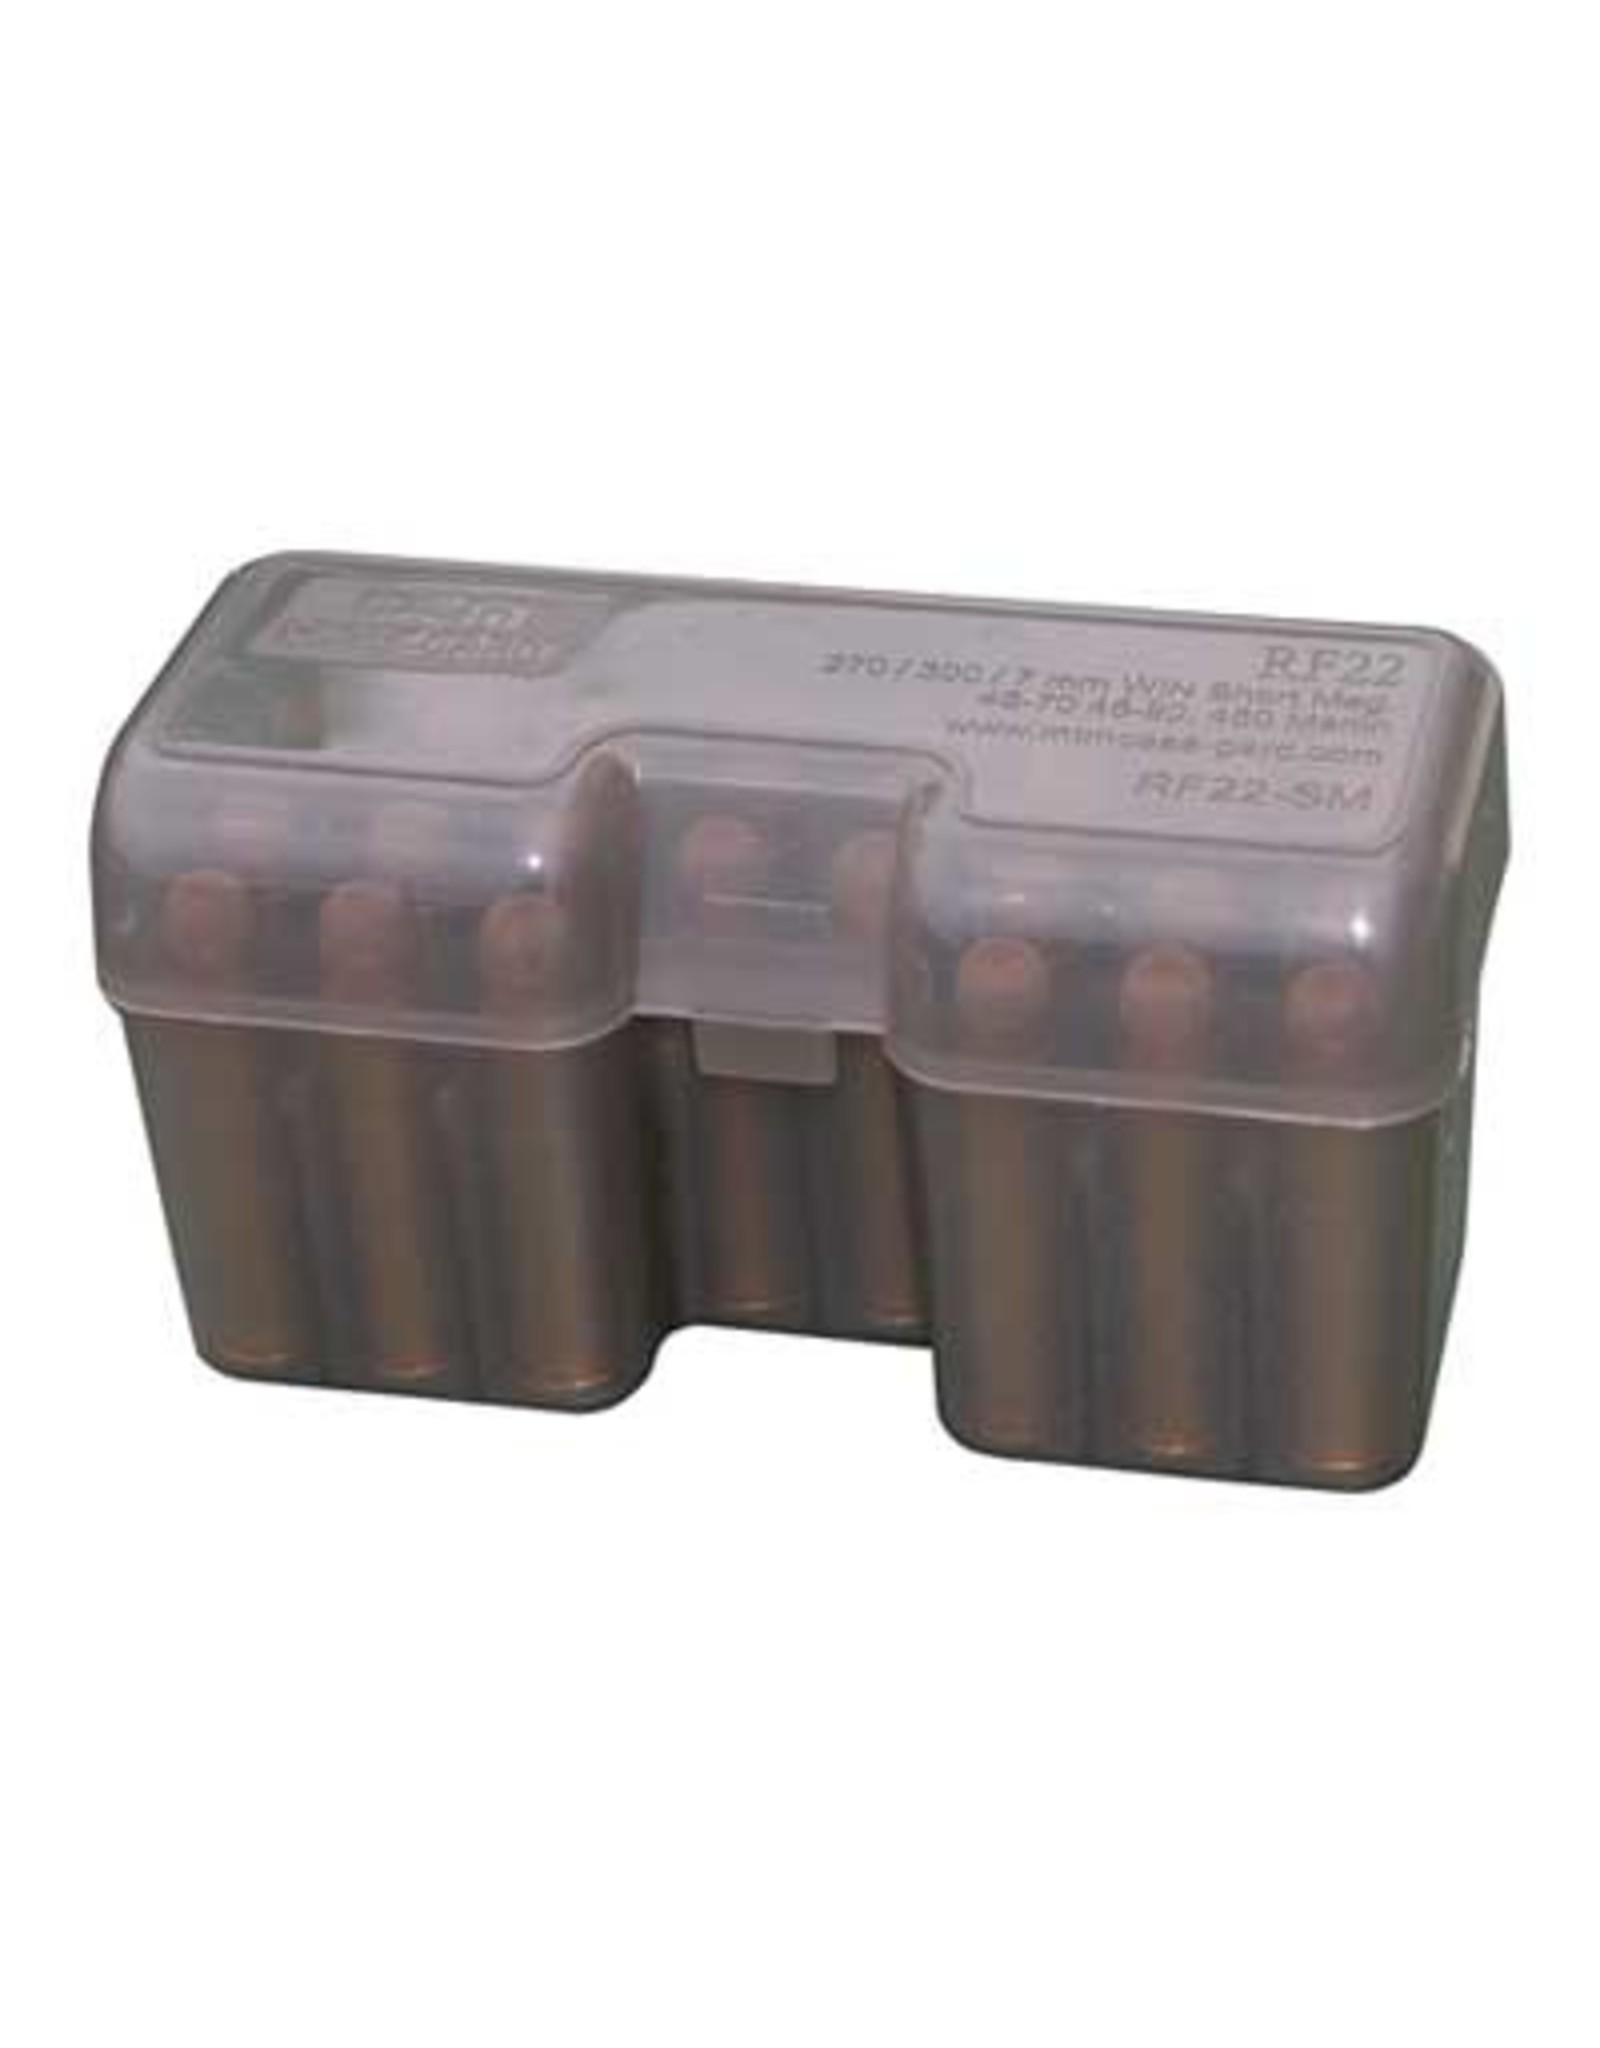 MTM Case-Gard MTM RF22-SM-41 Case-Gard Flip-Top 22-Round Rifle Ammo Box Short Mags